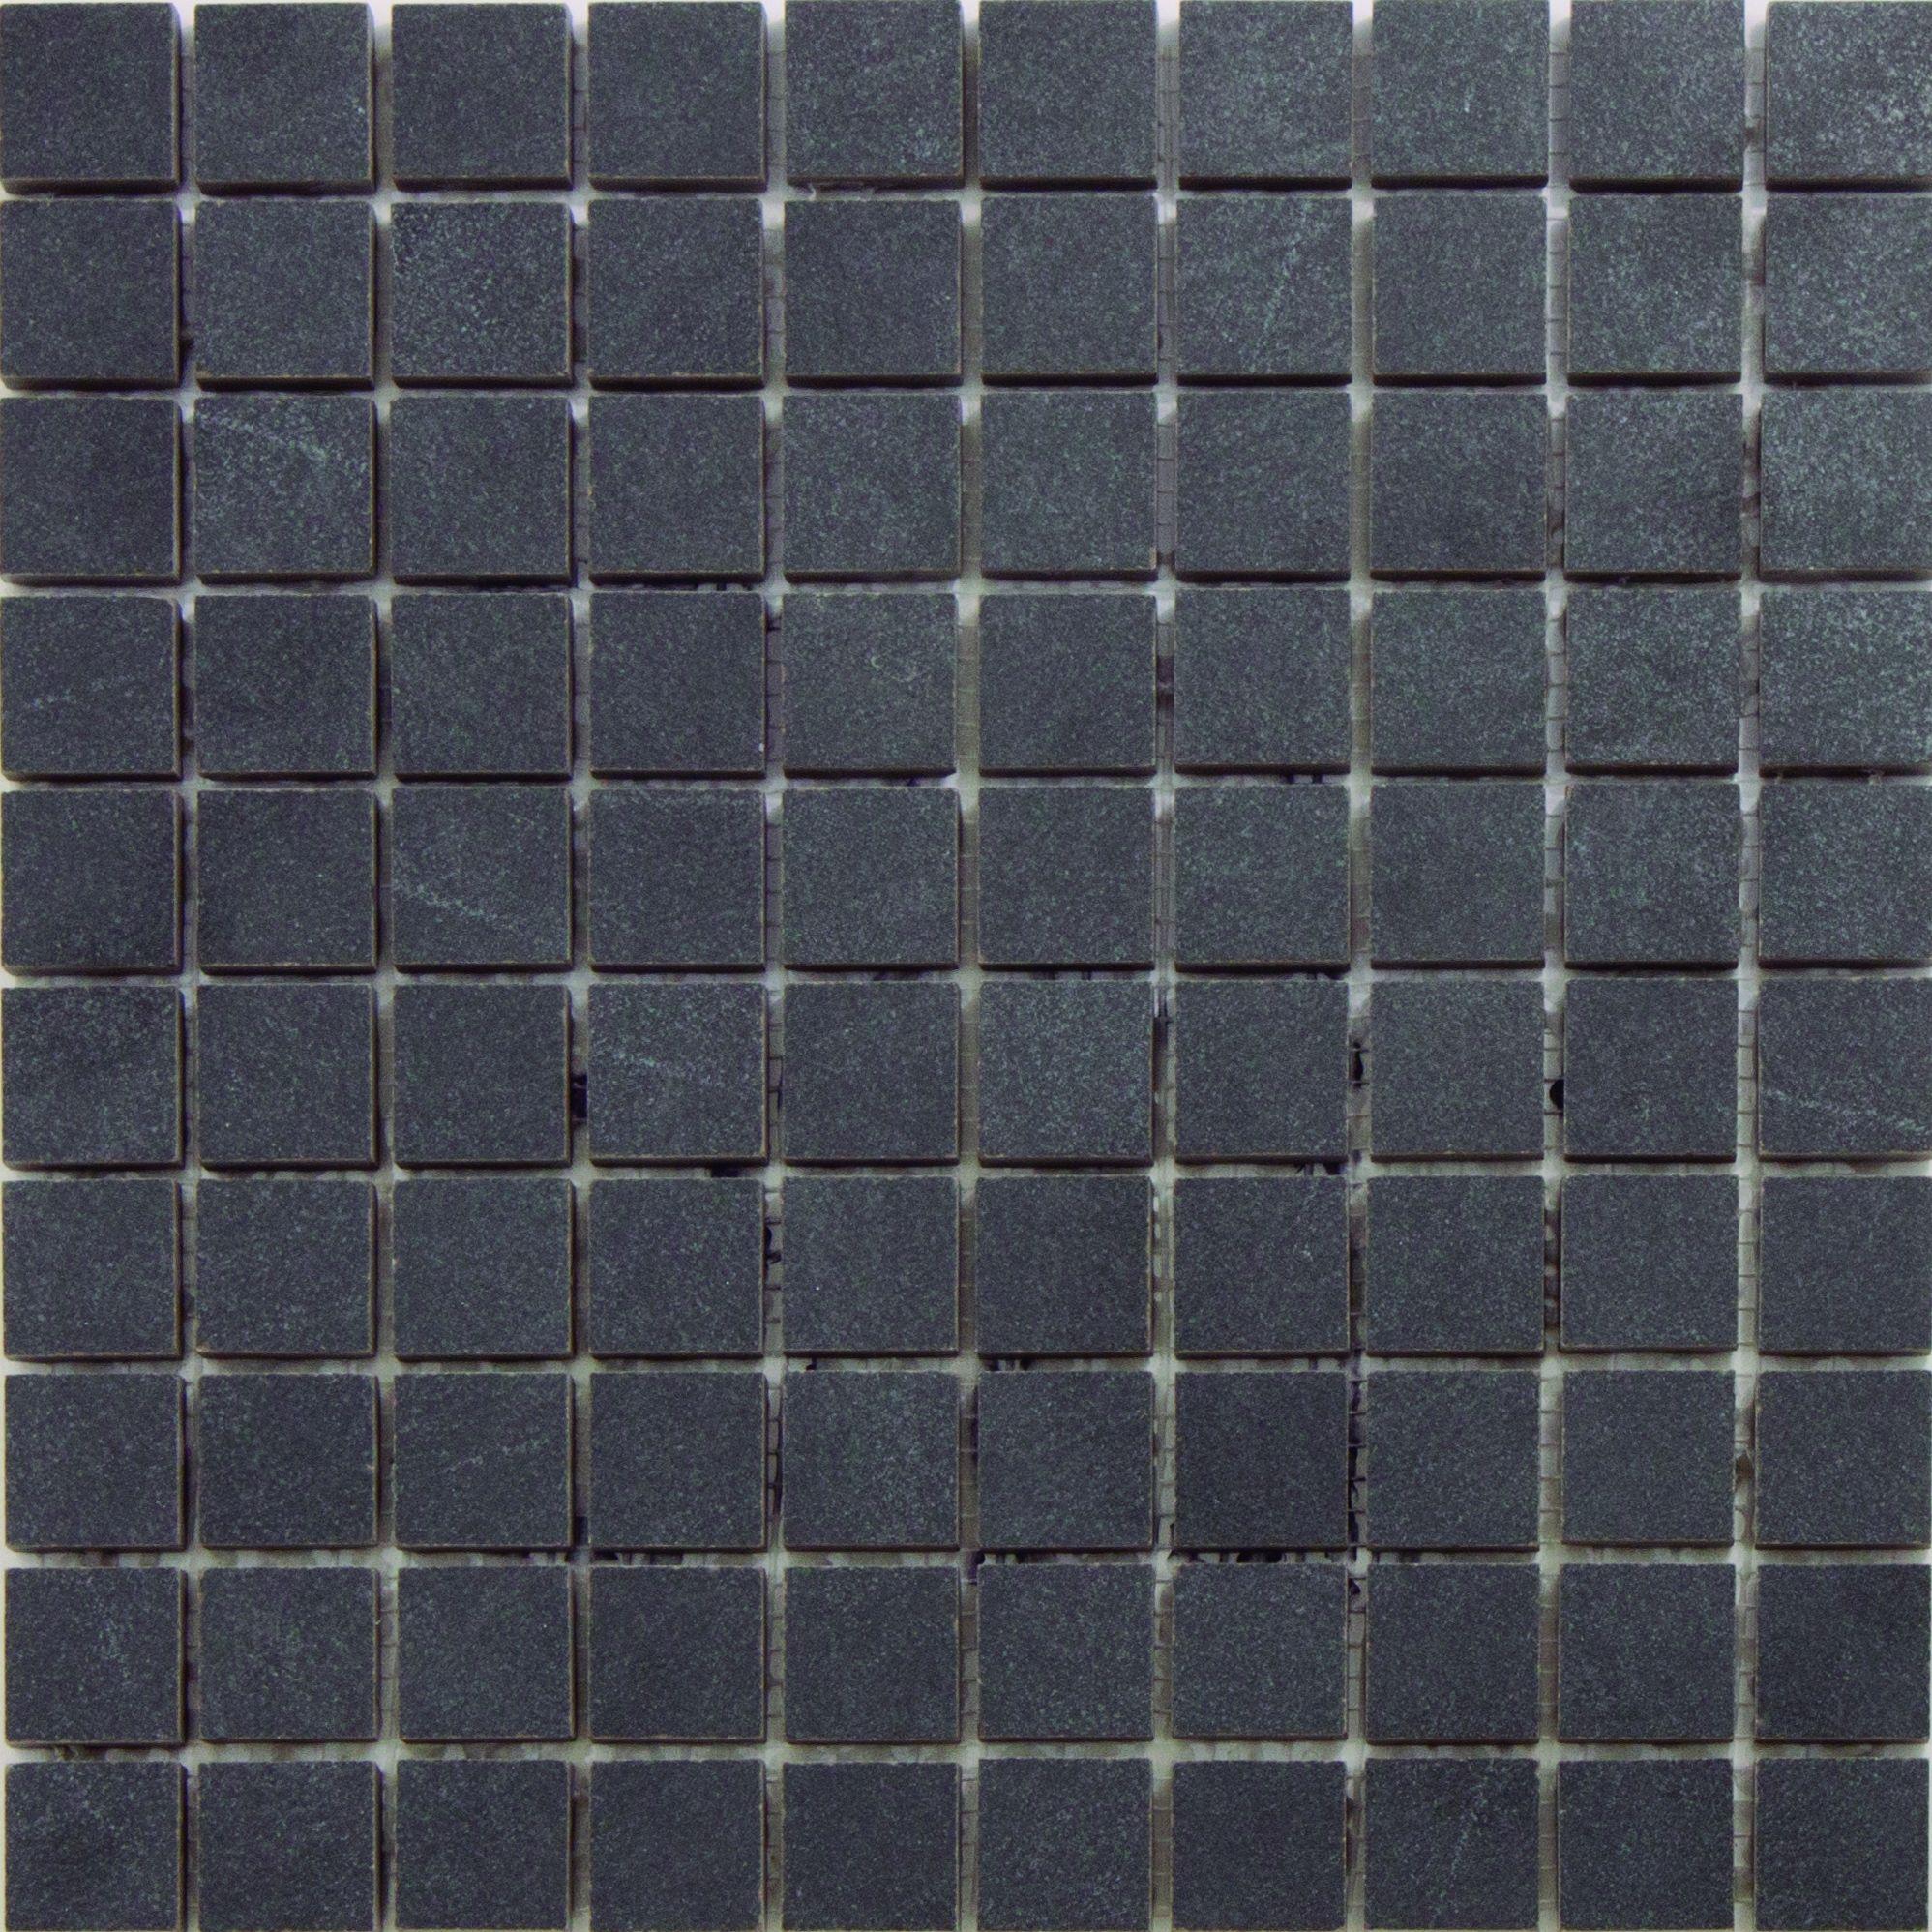 Limestone floor tiles mosaic ceramic mosaic tiles atala limestone floor tiles mosaic ceramic mosaic tiles atala tile and sanitary berlin dailygadgetfo Gallery